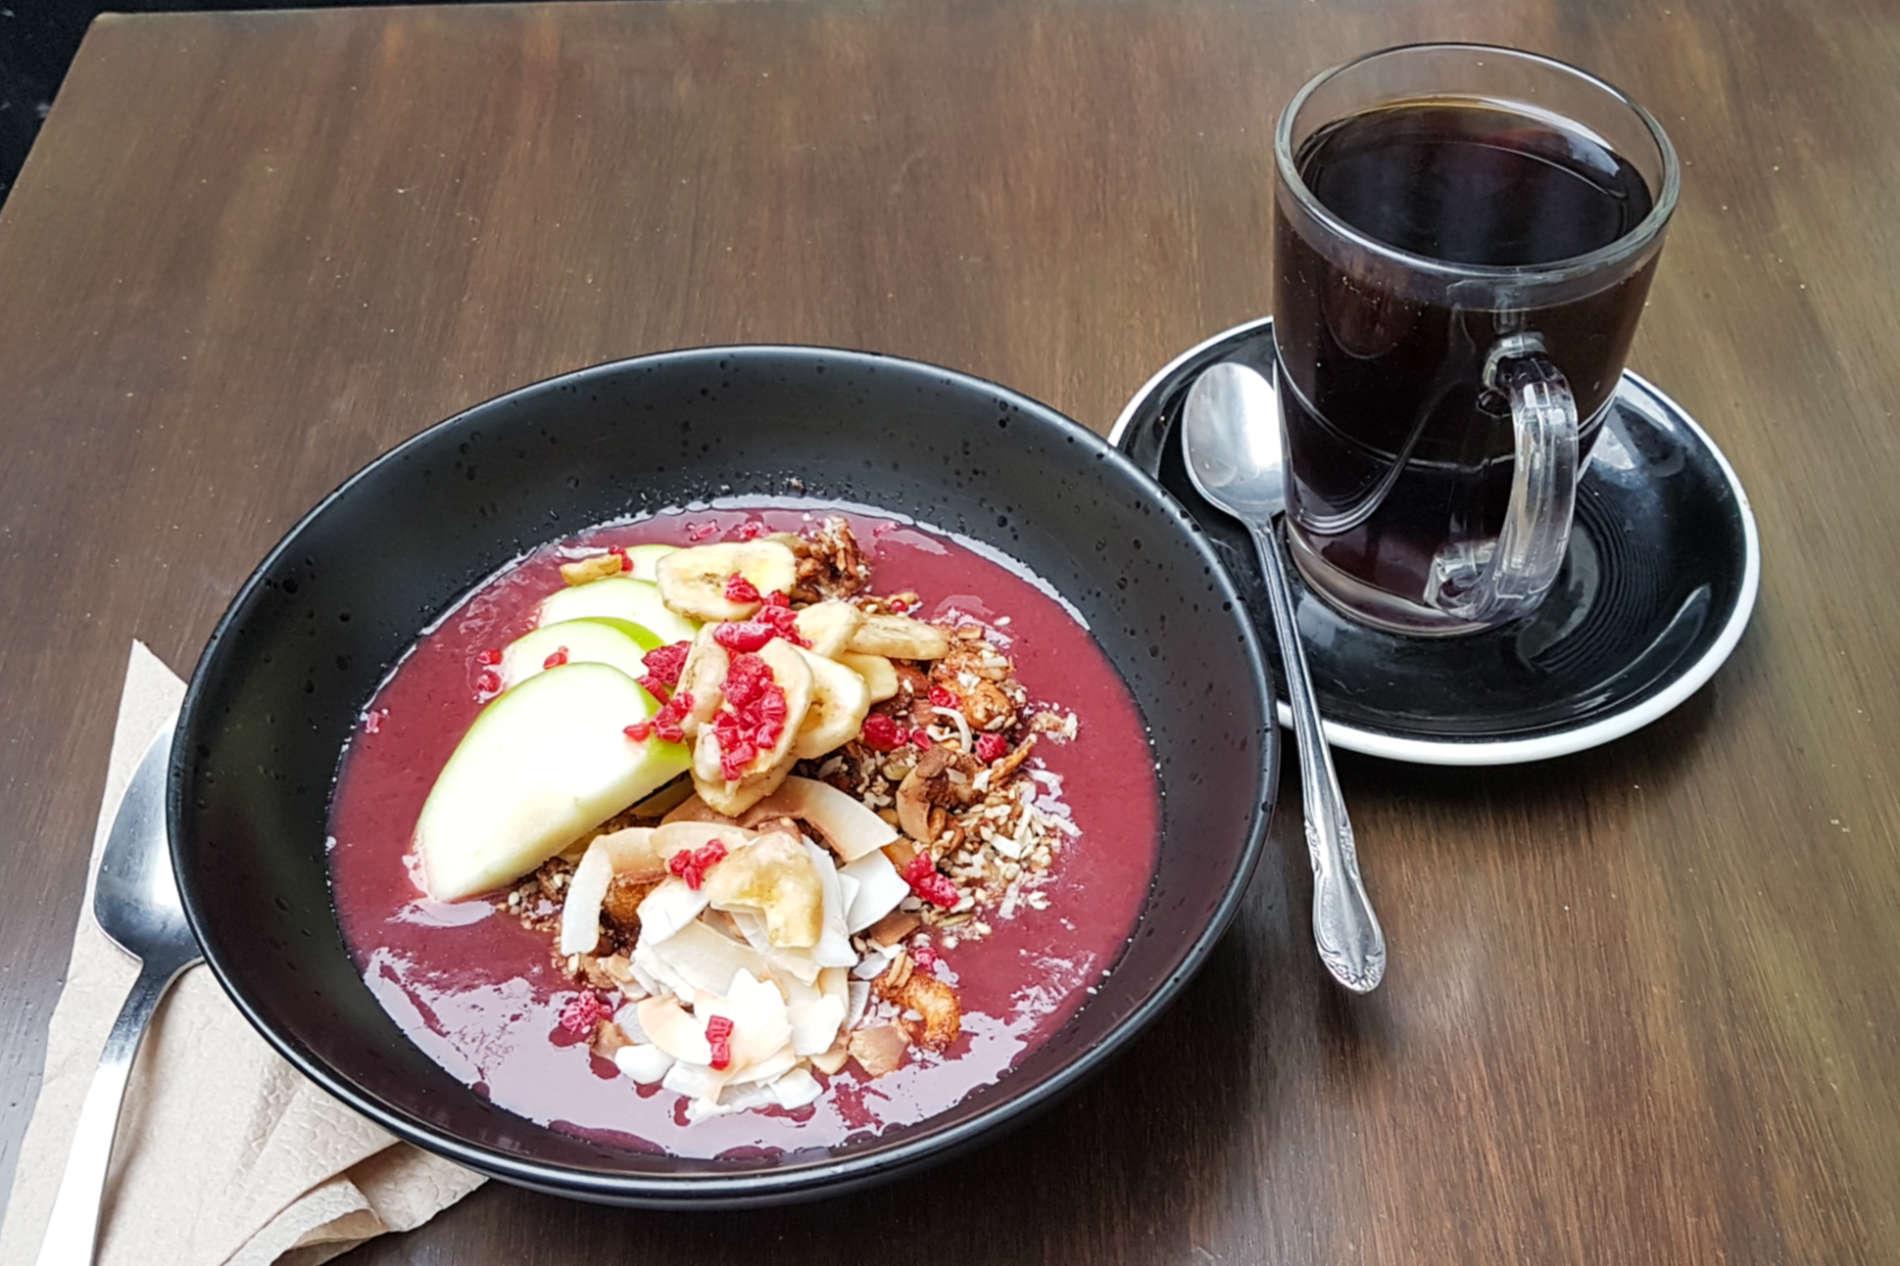 Black Coffee granola and coffee